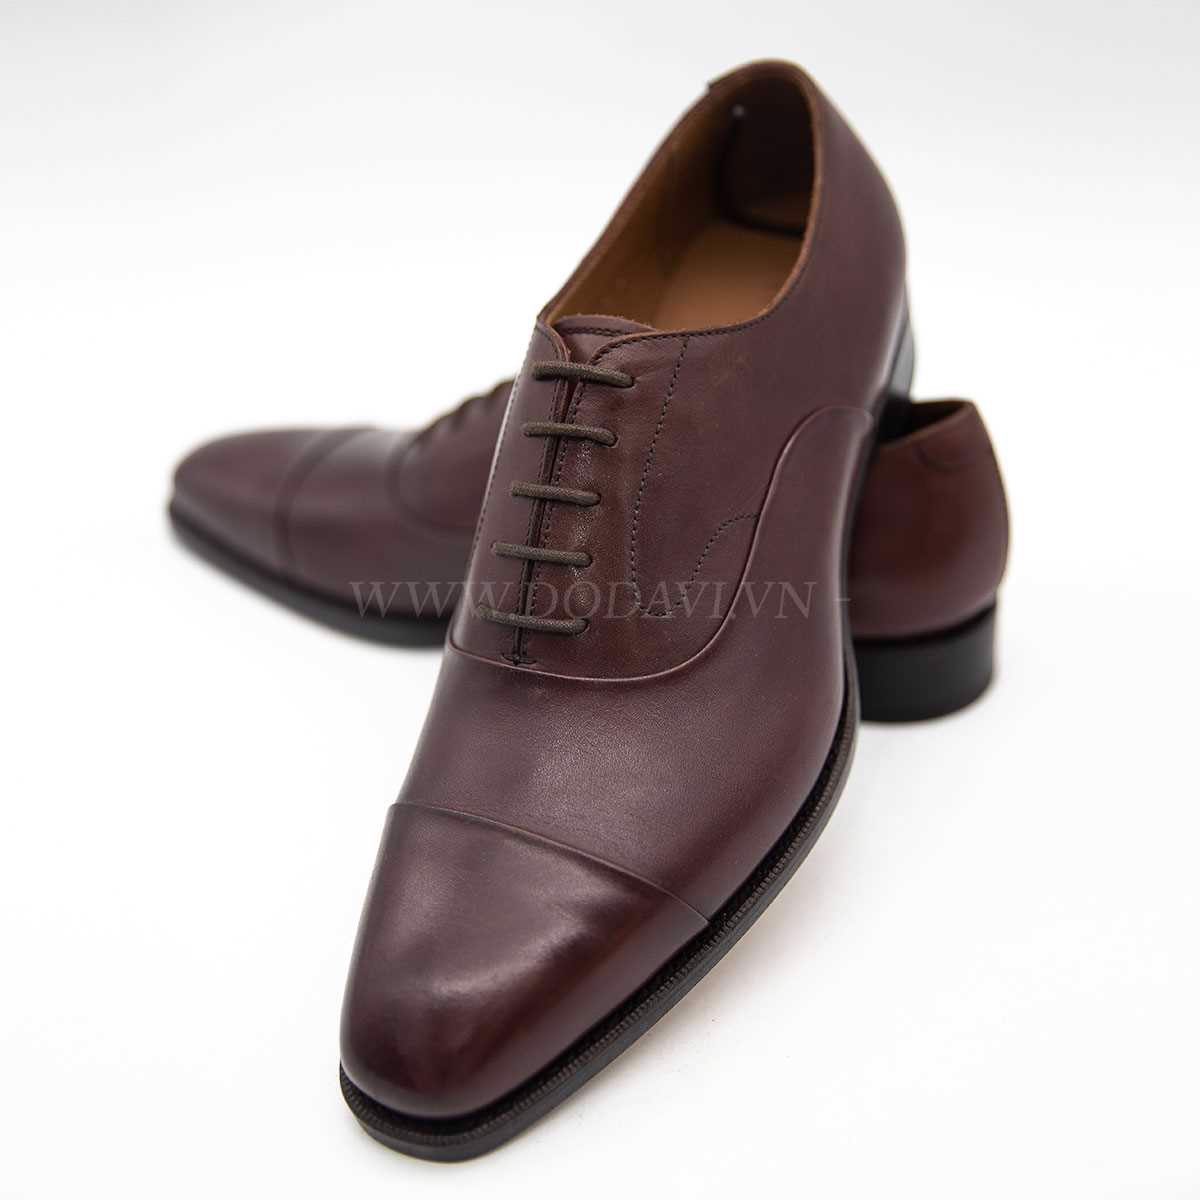 Giày đế da 300205